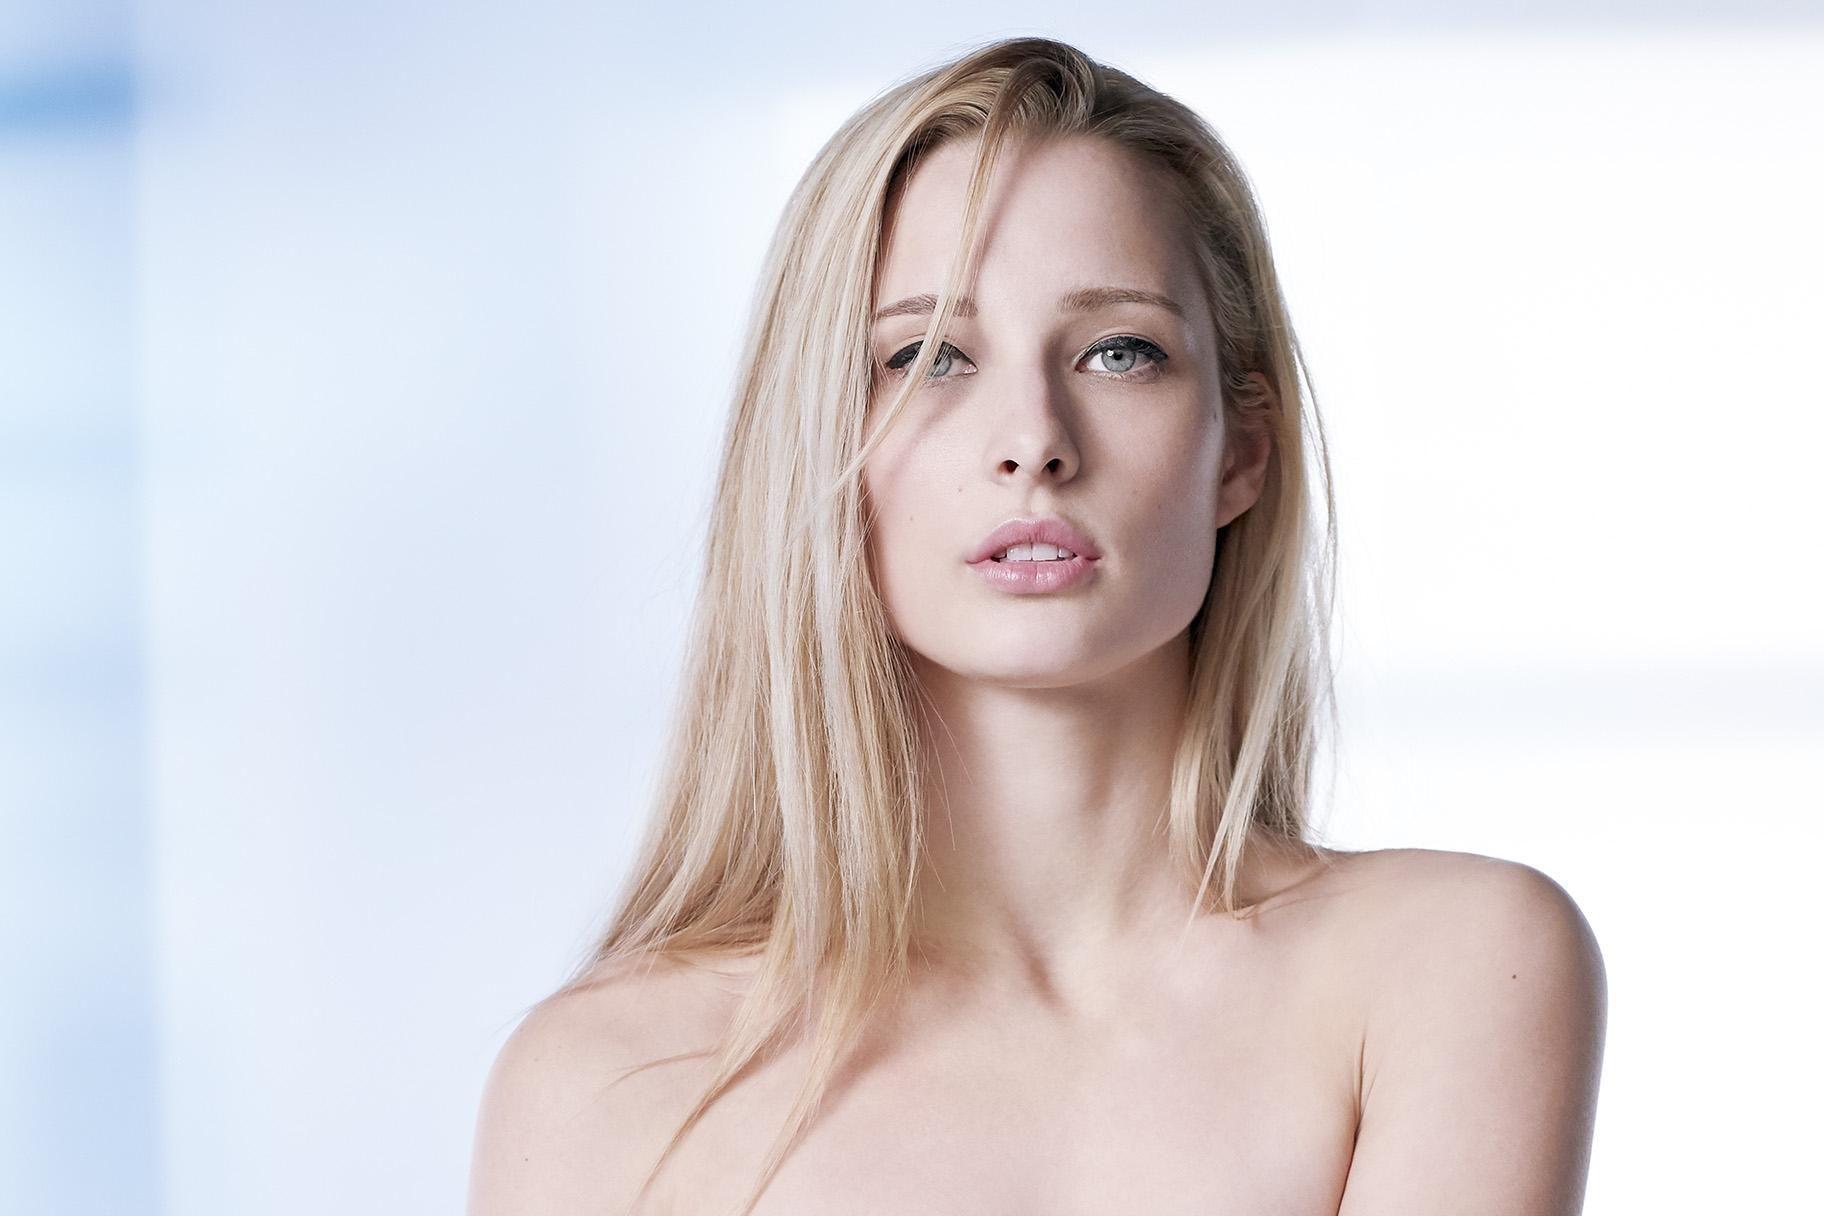 Youtube Nicky Hilton nudes (35 photo), Pussy, Hot, Feet, panties 2020